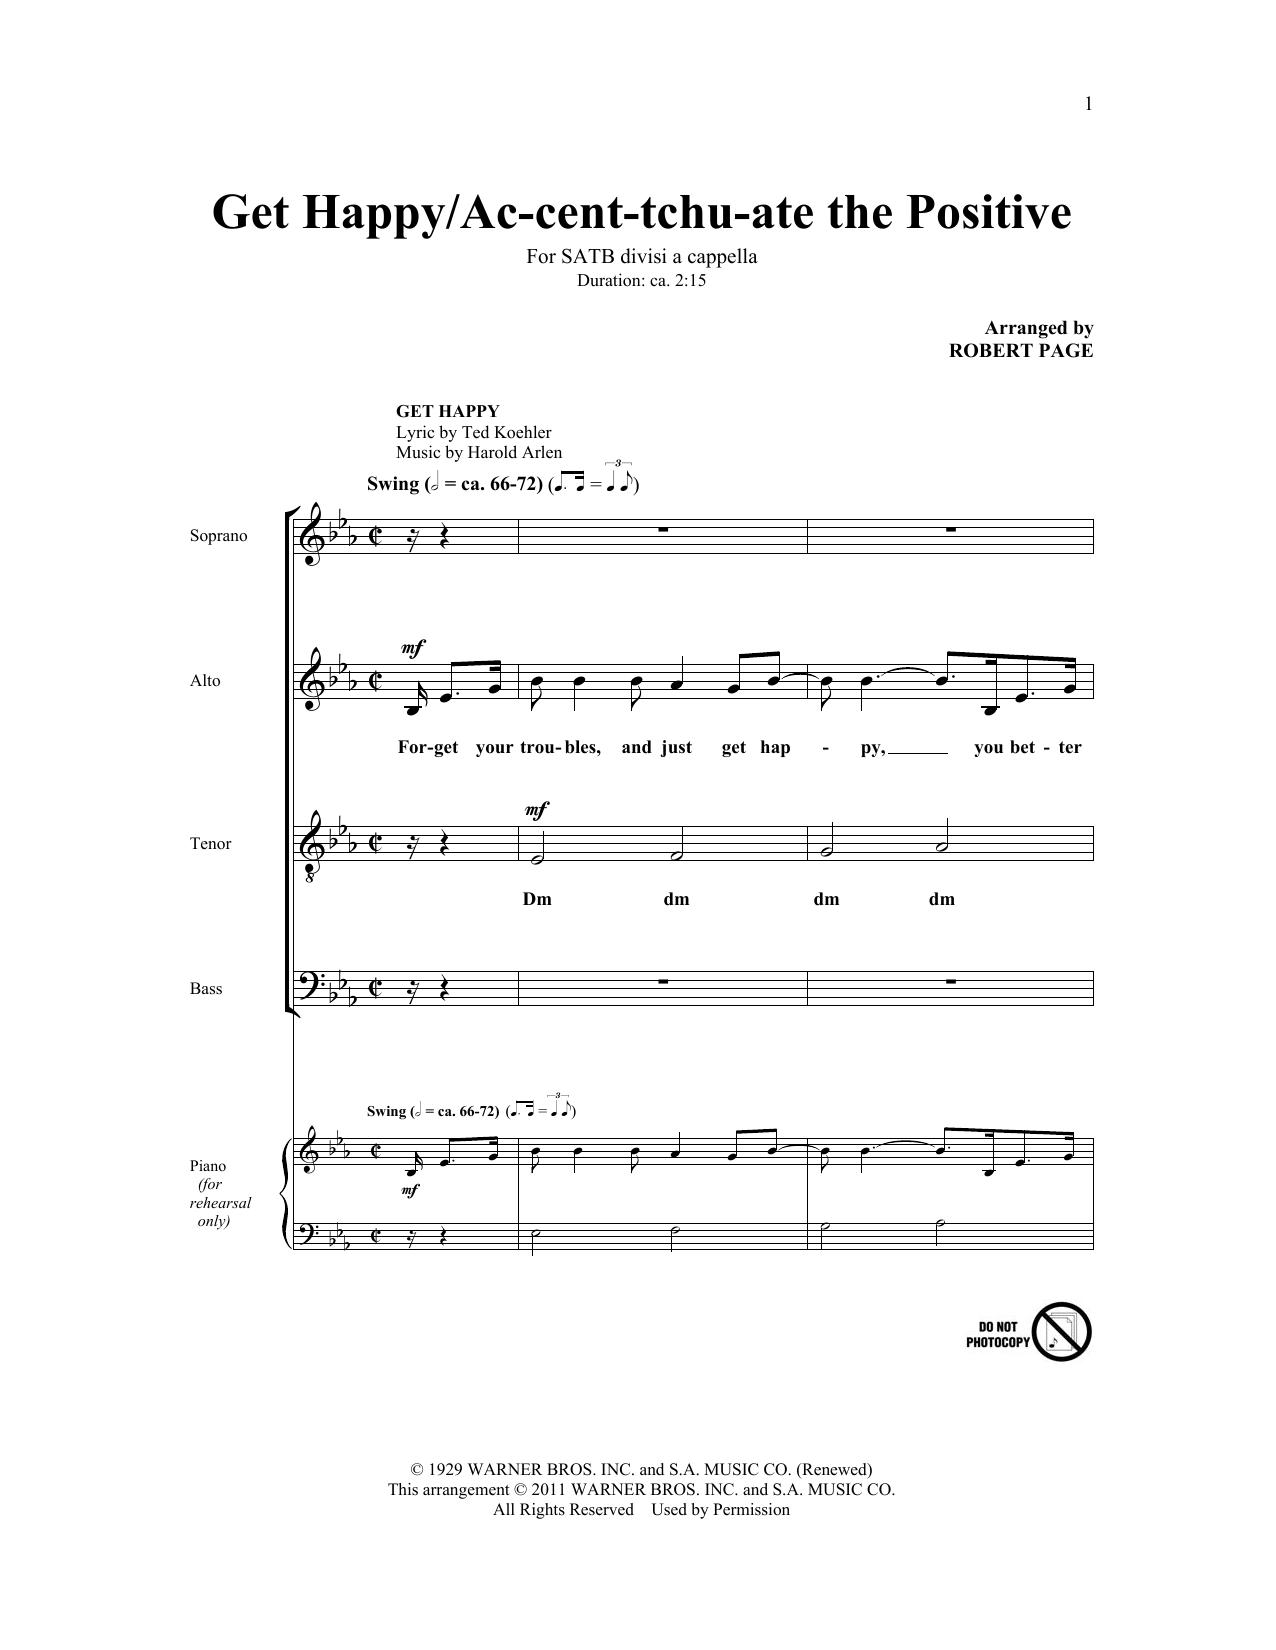 Ac-cent-tchu-ate The Positive (SATB Choir)